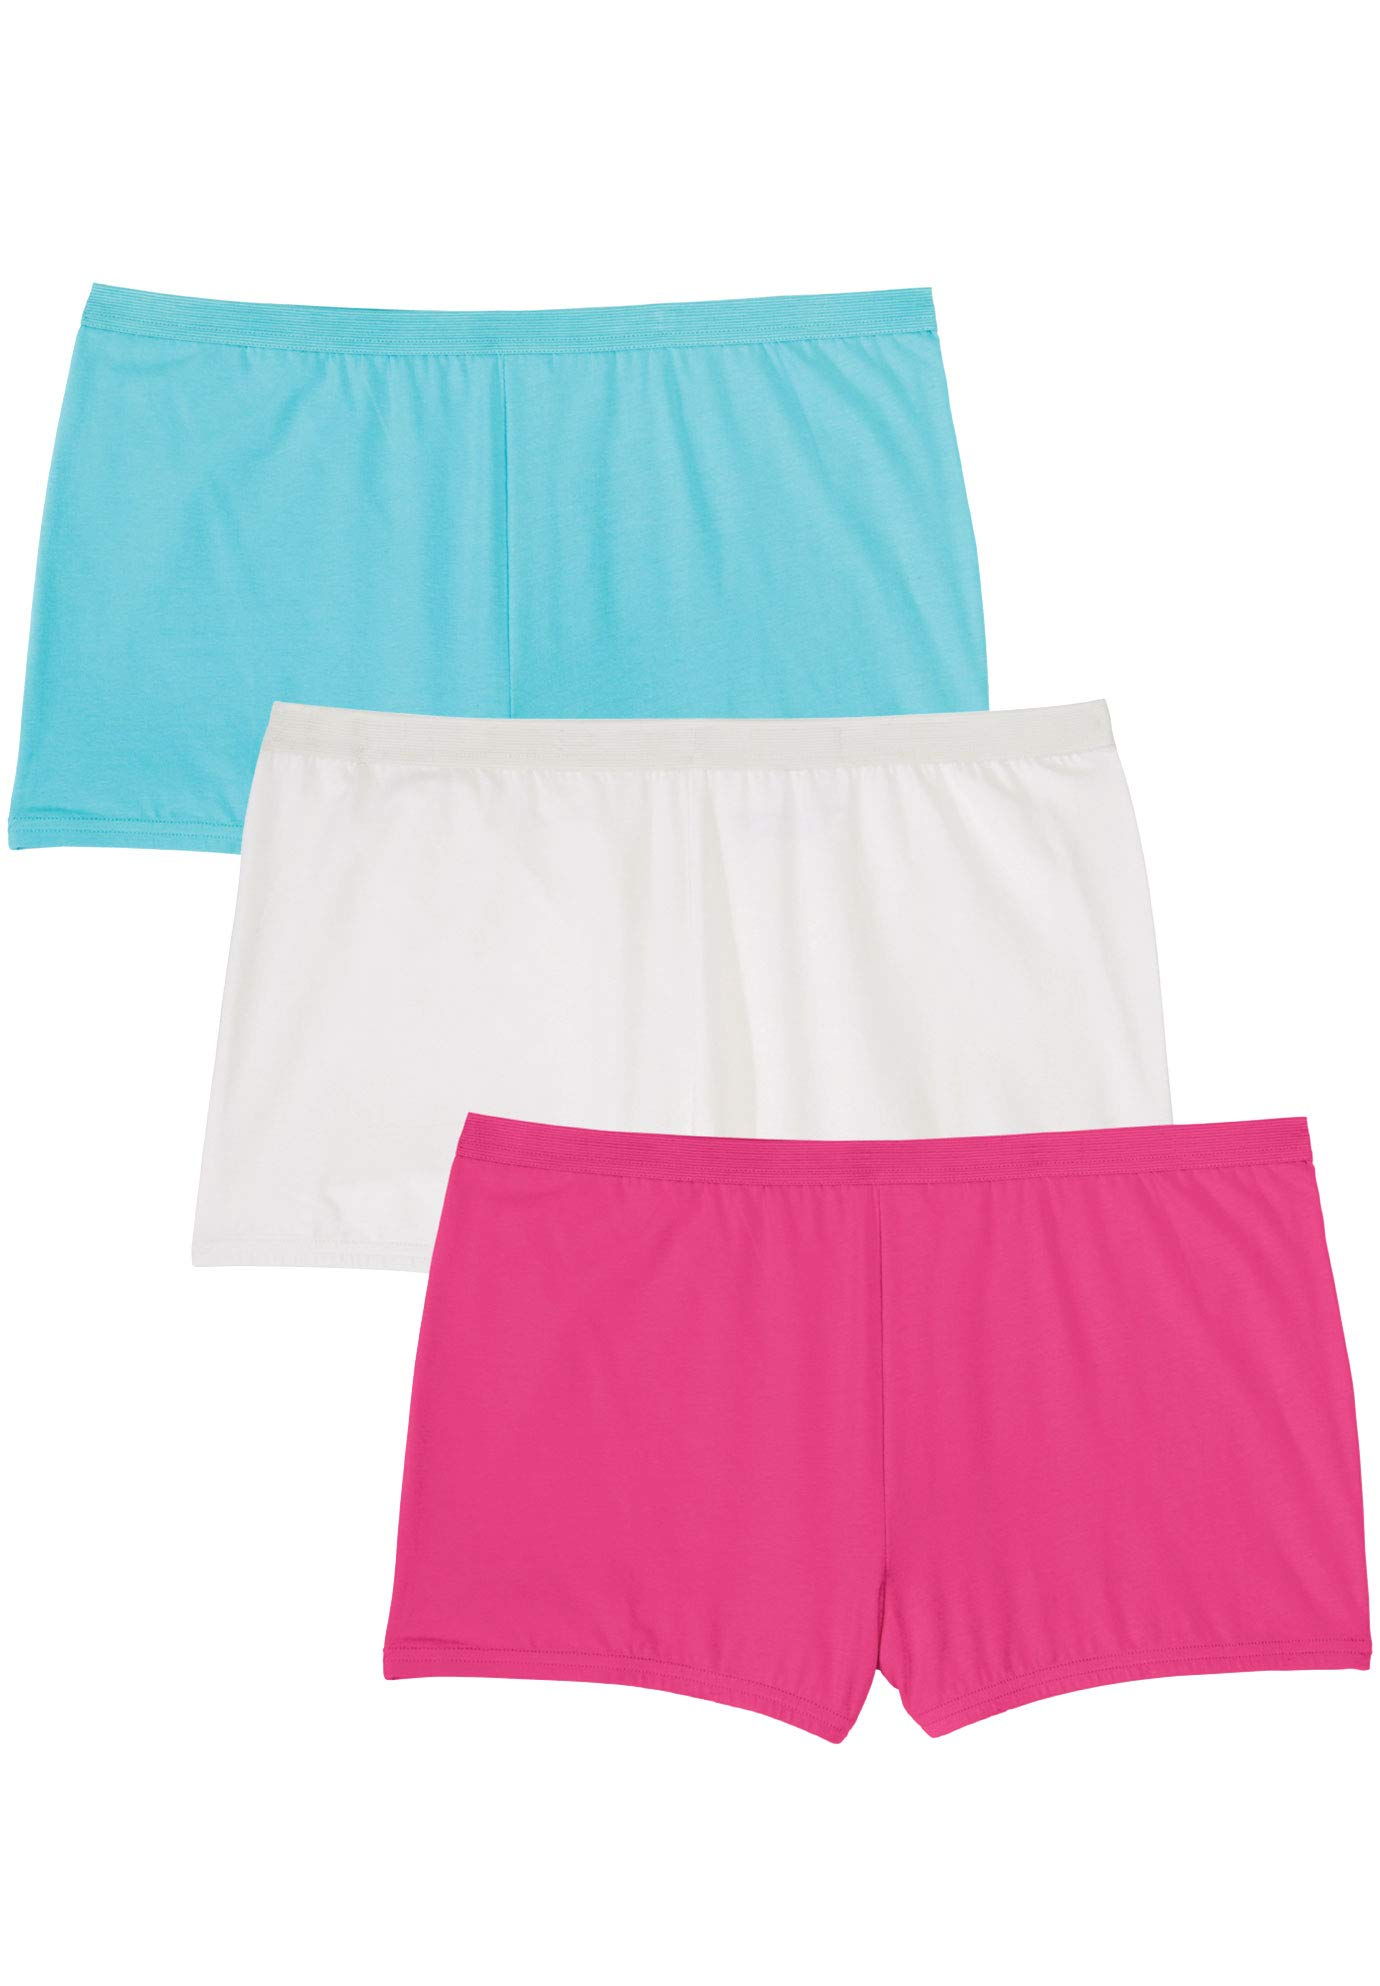 Comfort Choice Women's Plus Size 3-Pack Boyshort